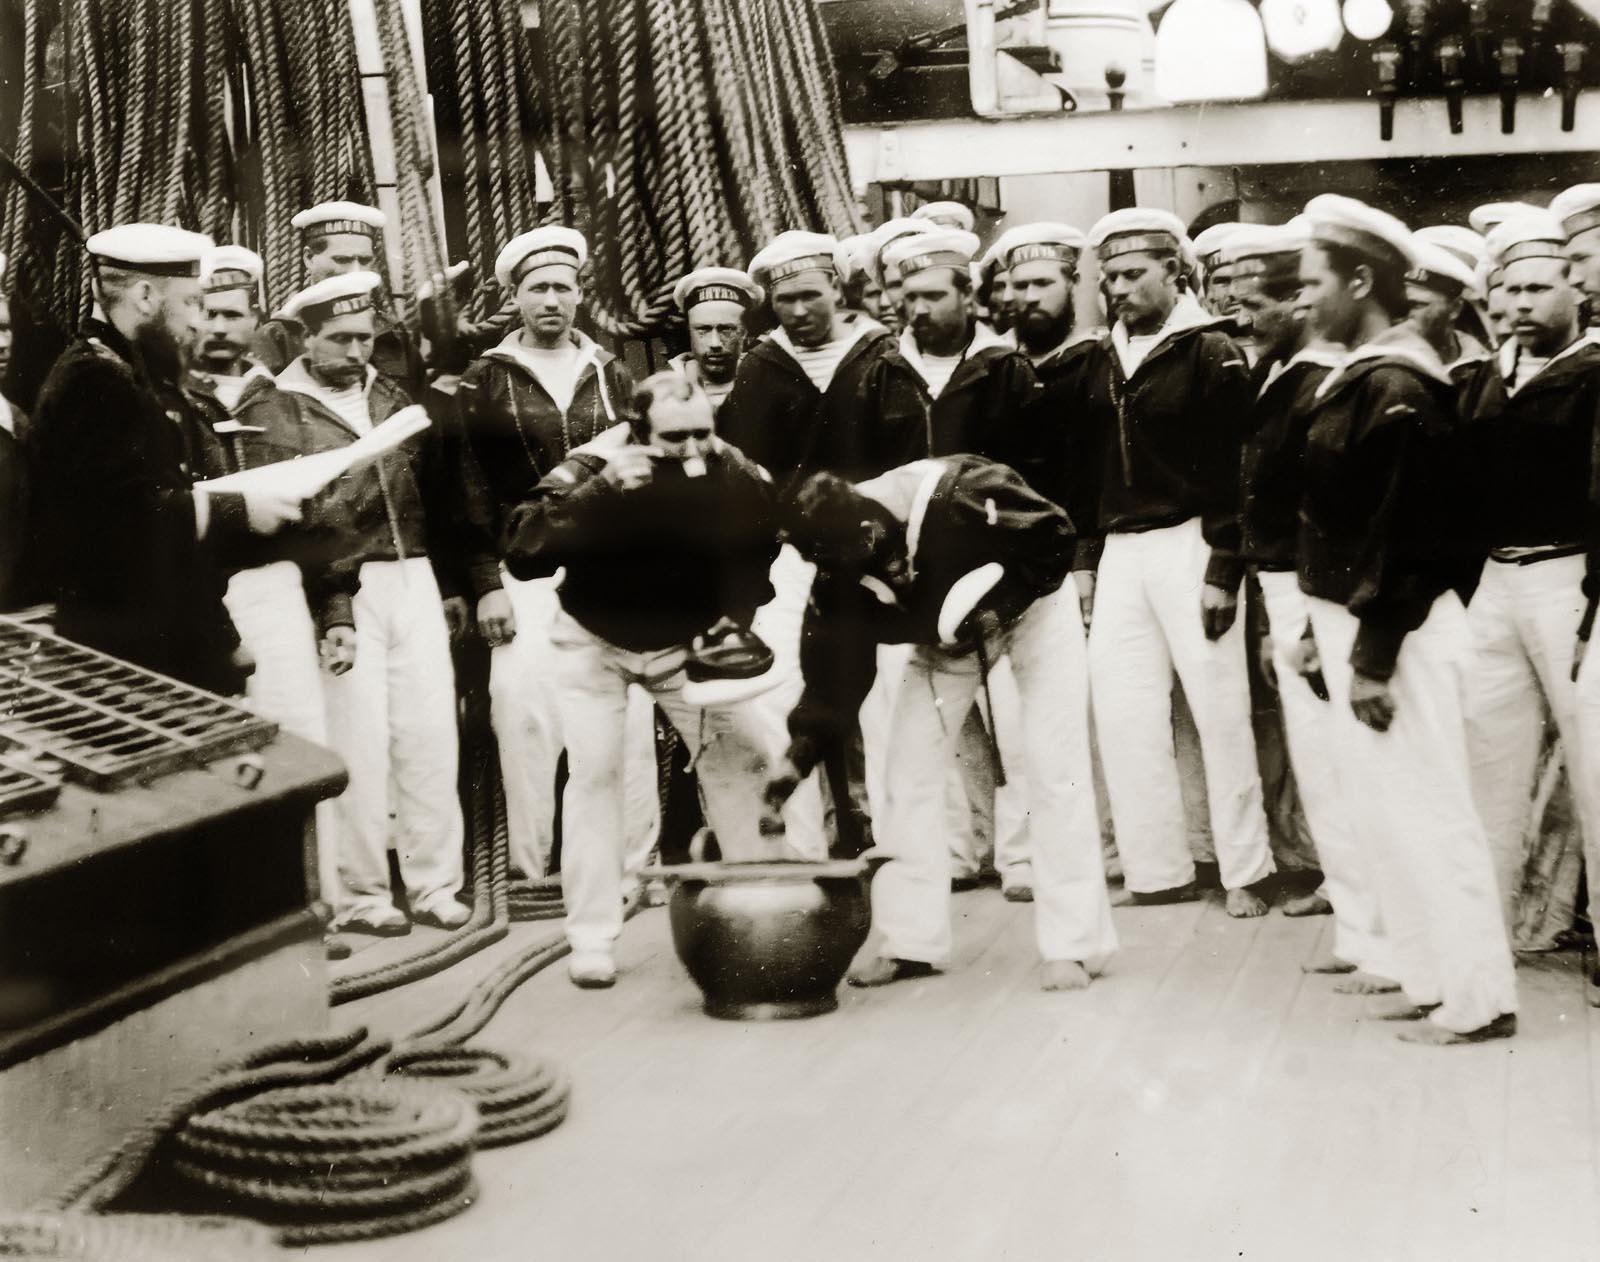 Фото №750856. Раздача винной порции на корвете «Витязь» Фотография 1887 года